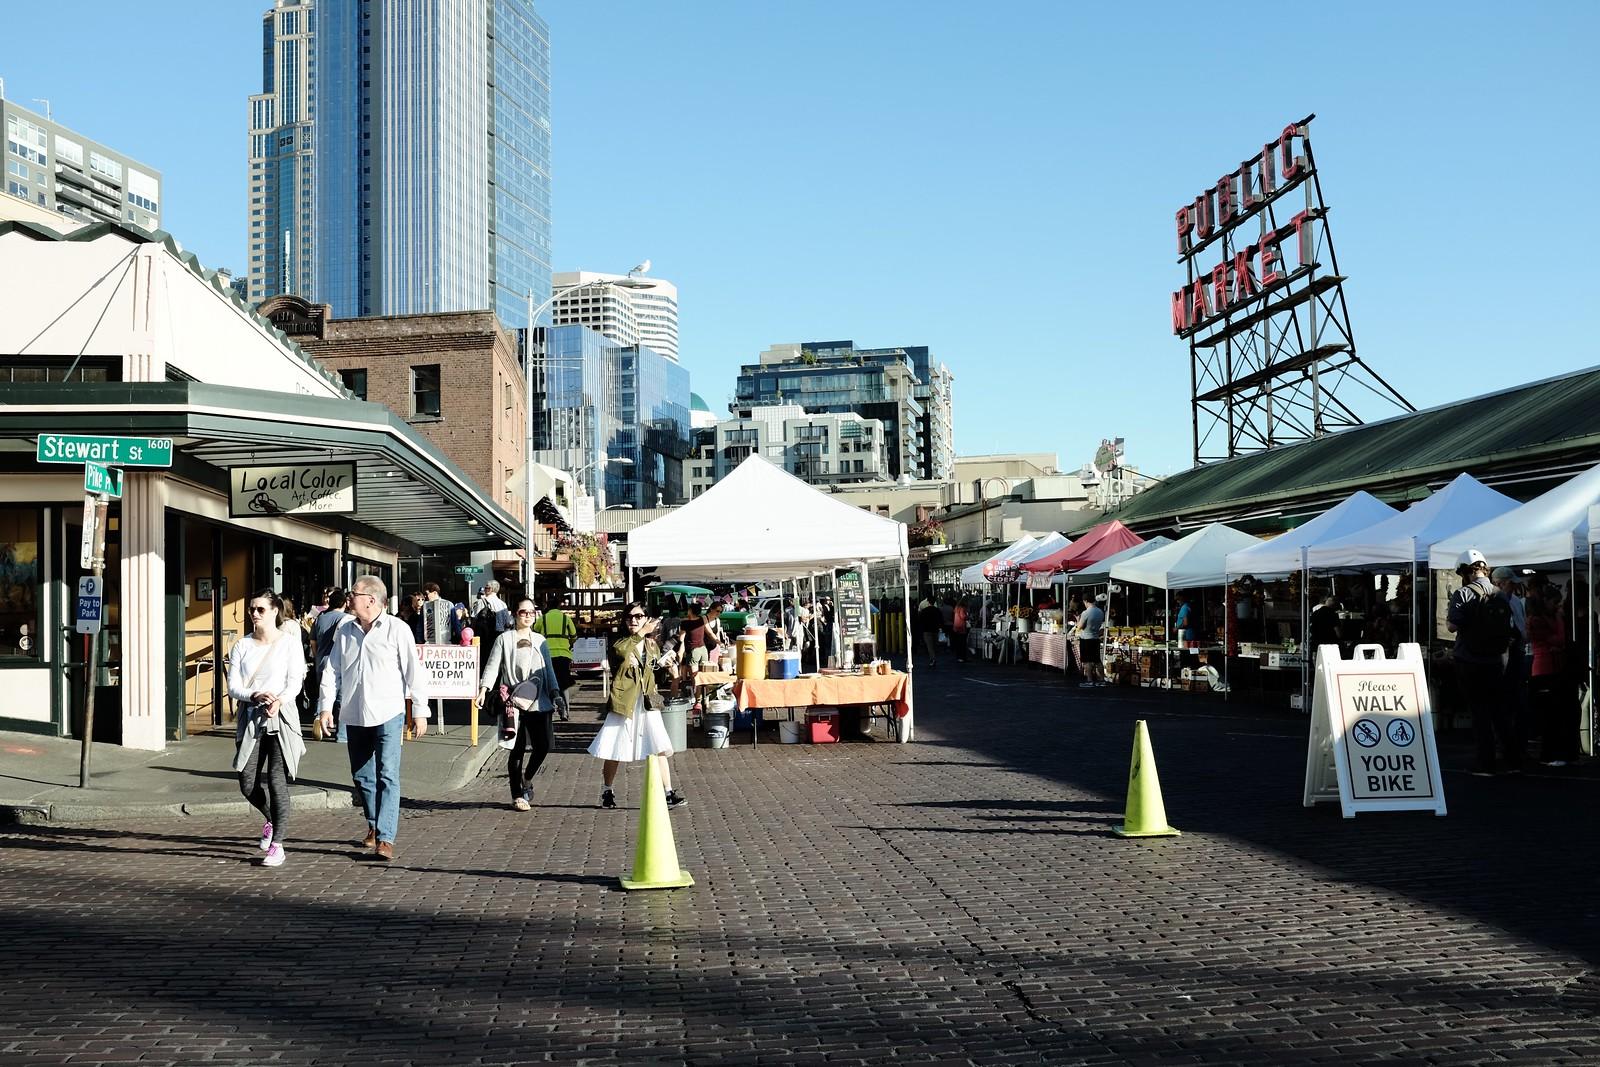 The Seattle taken by FUJIFILM X100S.